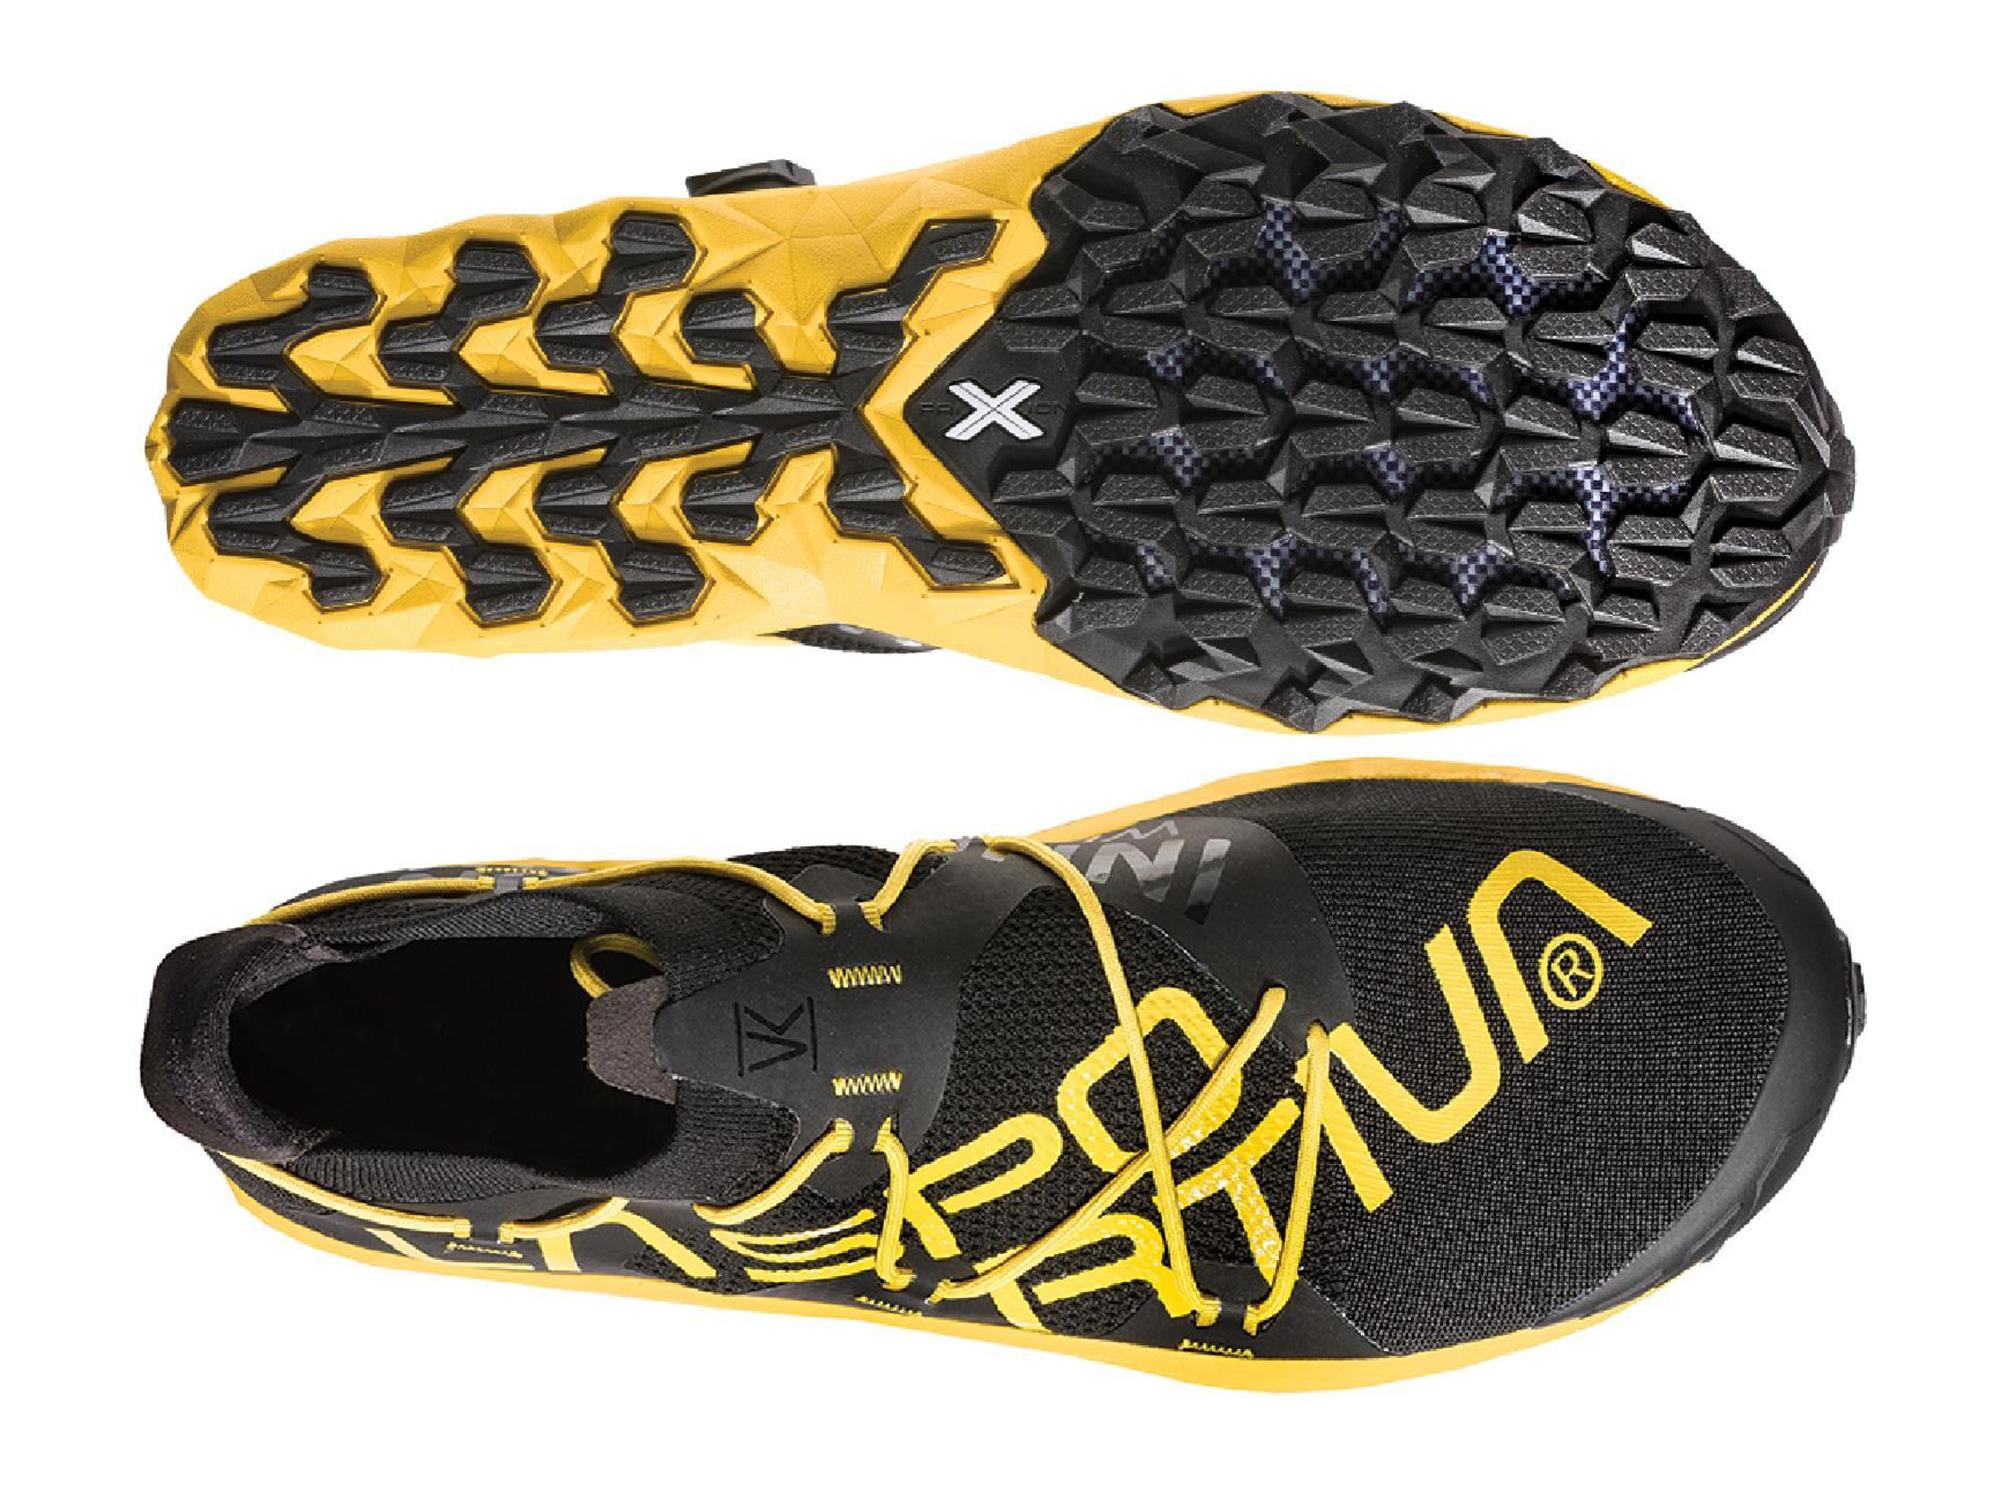 la sportiva vk trail running shoes